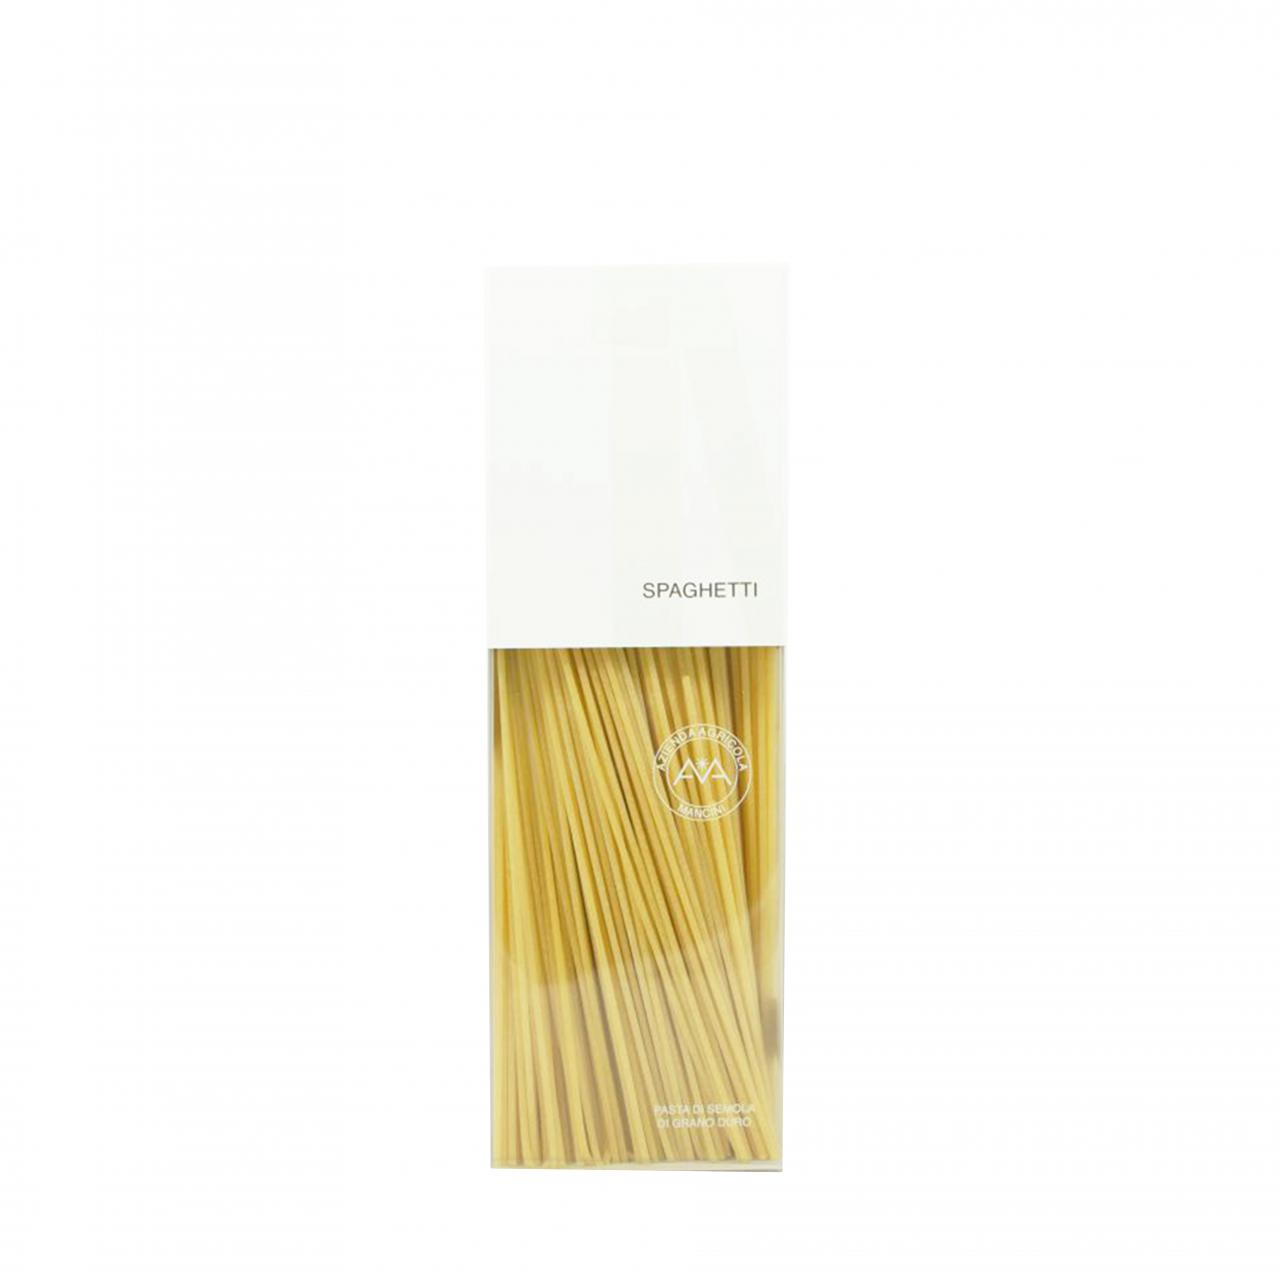 Spaghetti Hartweizennudeln